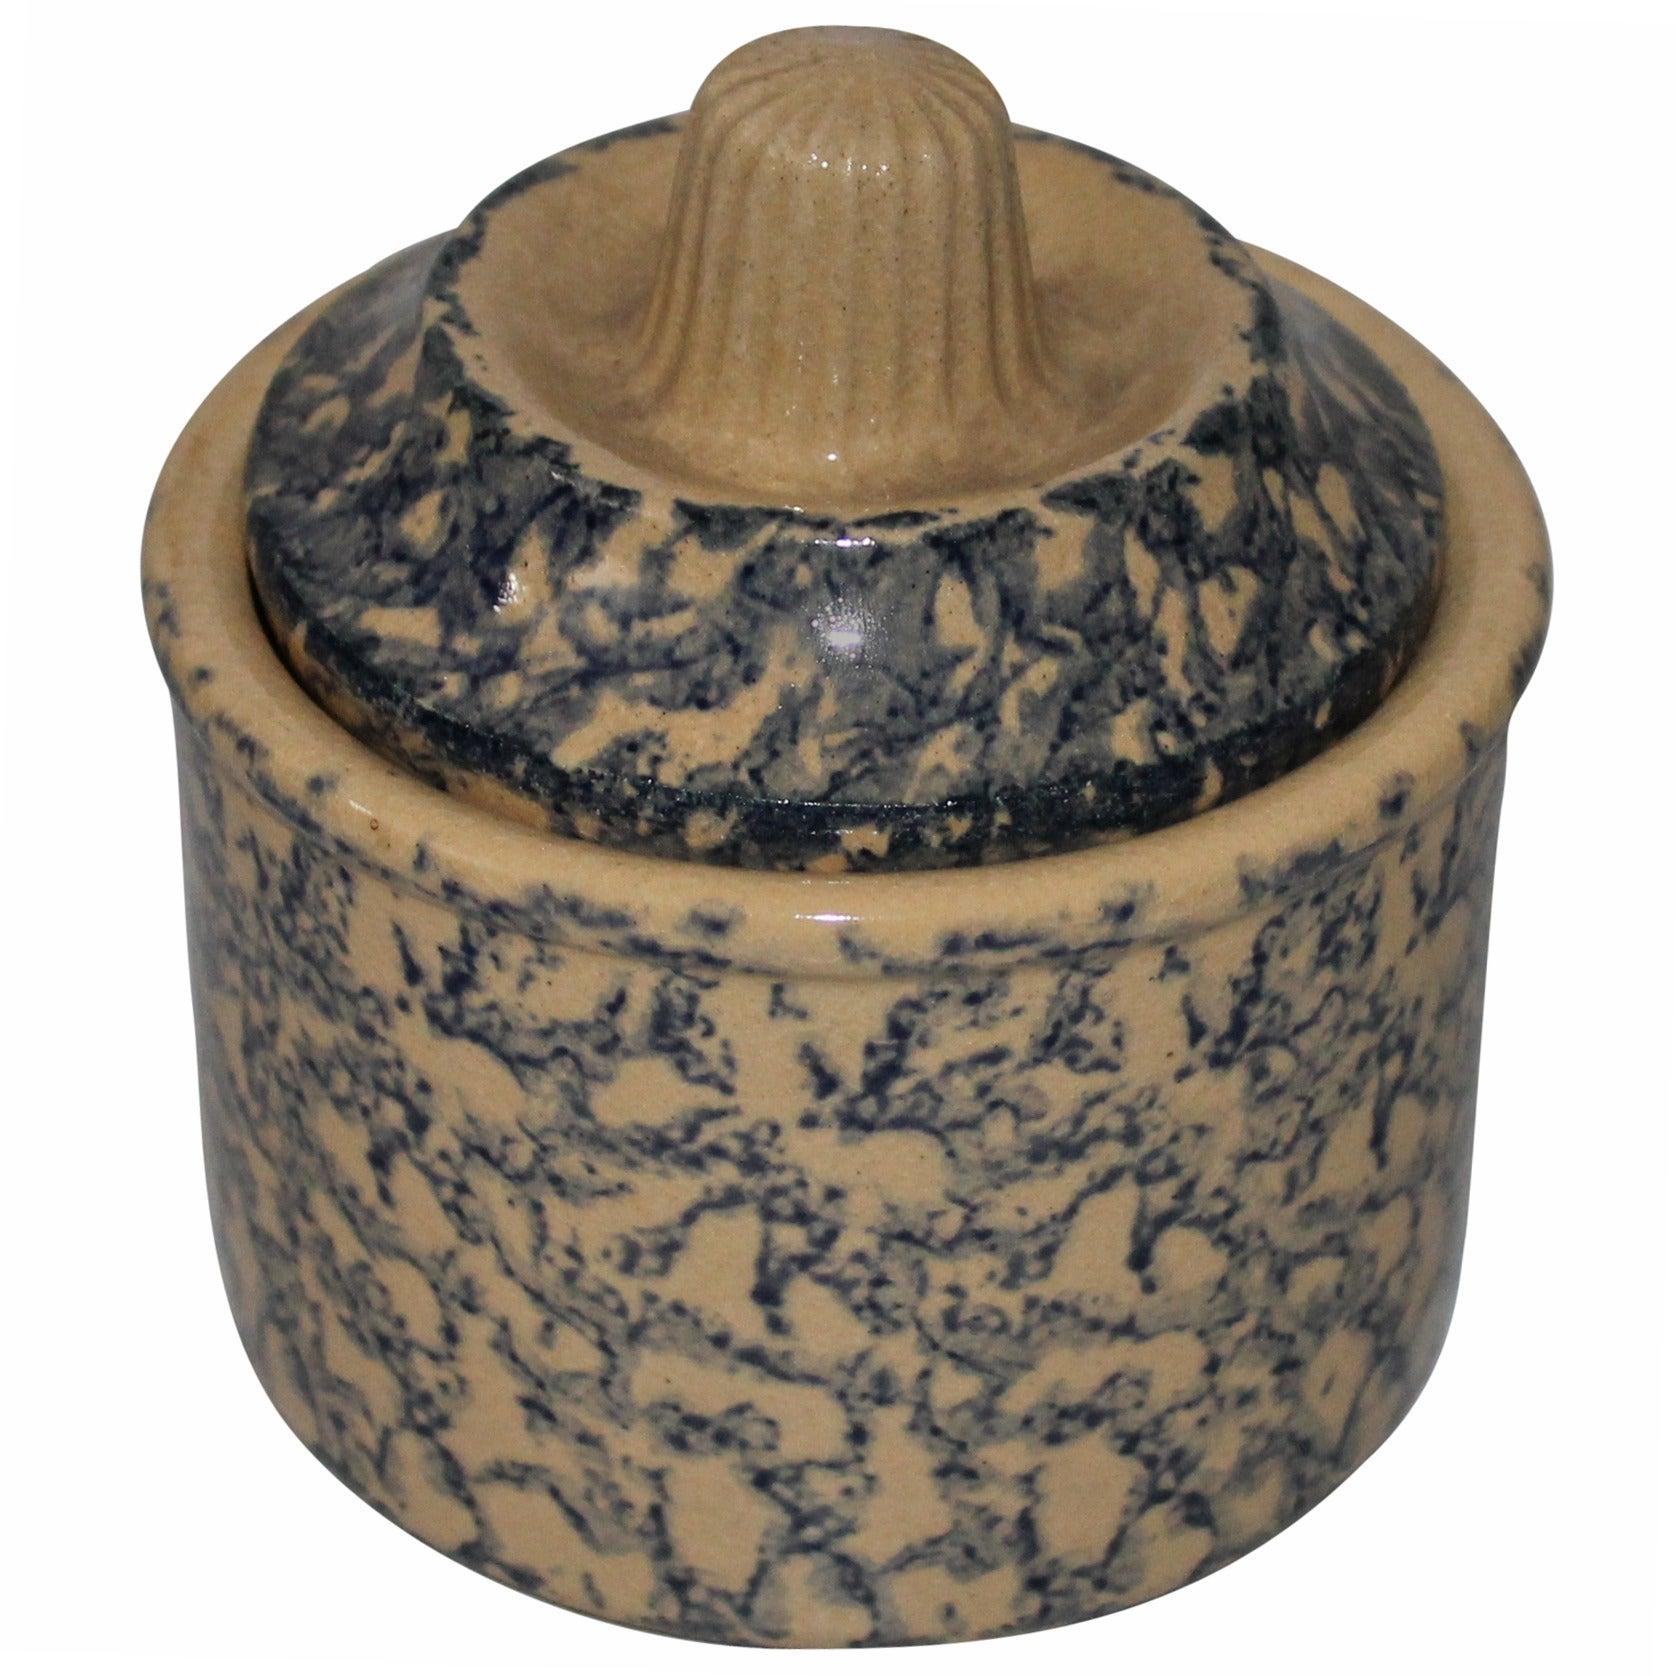 Early 20th Century Spongeware Jar